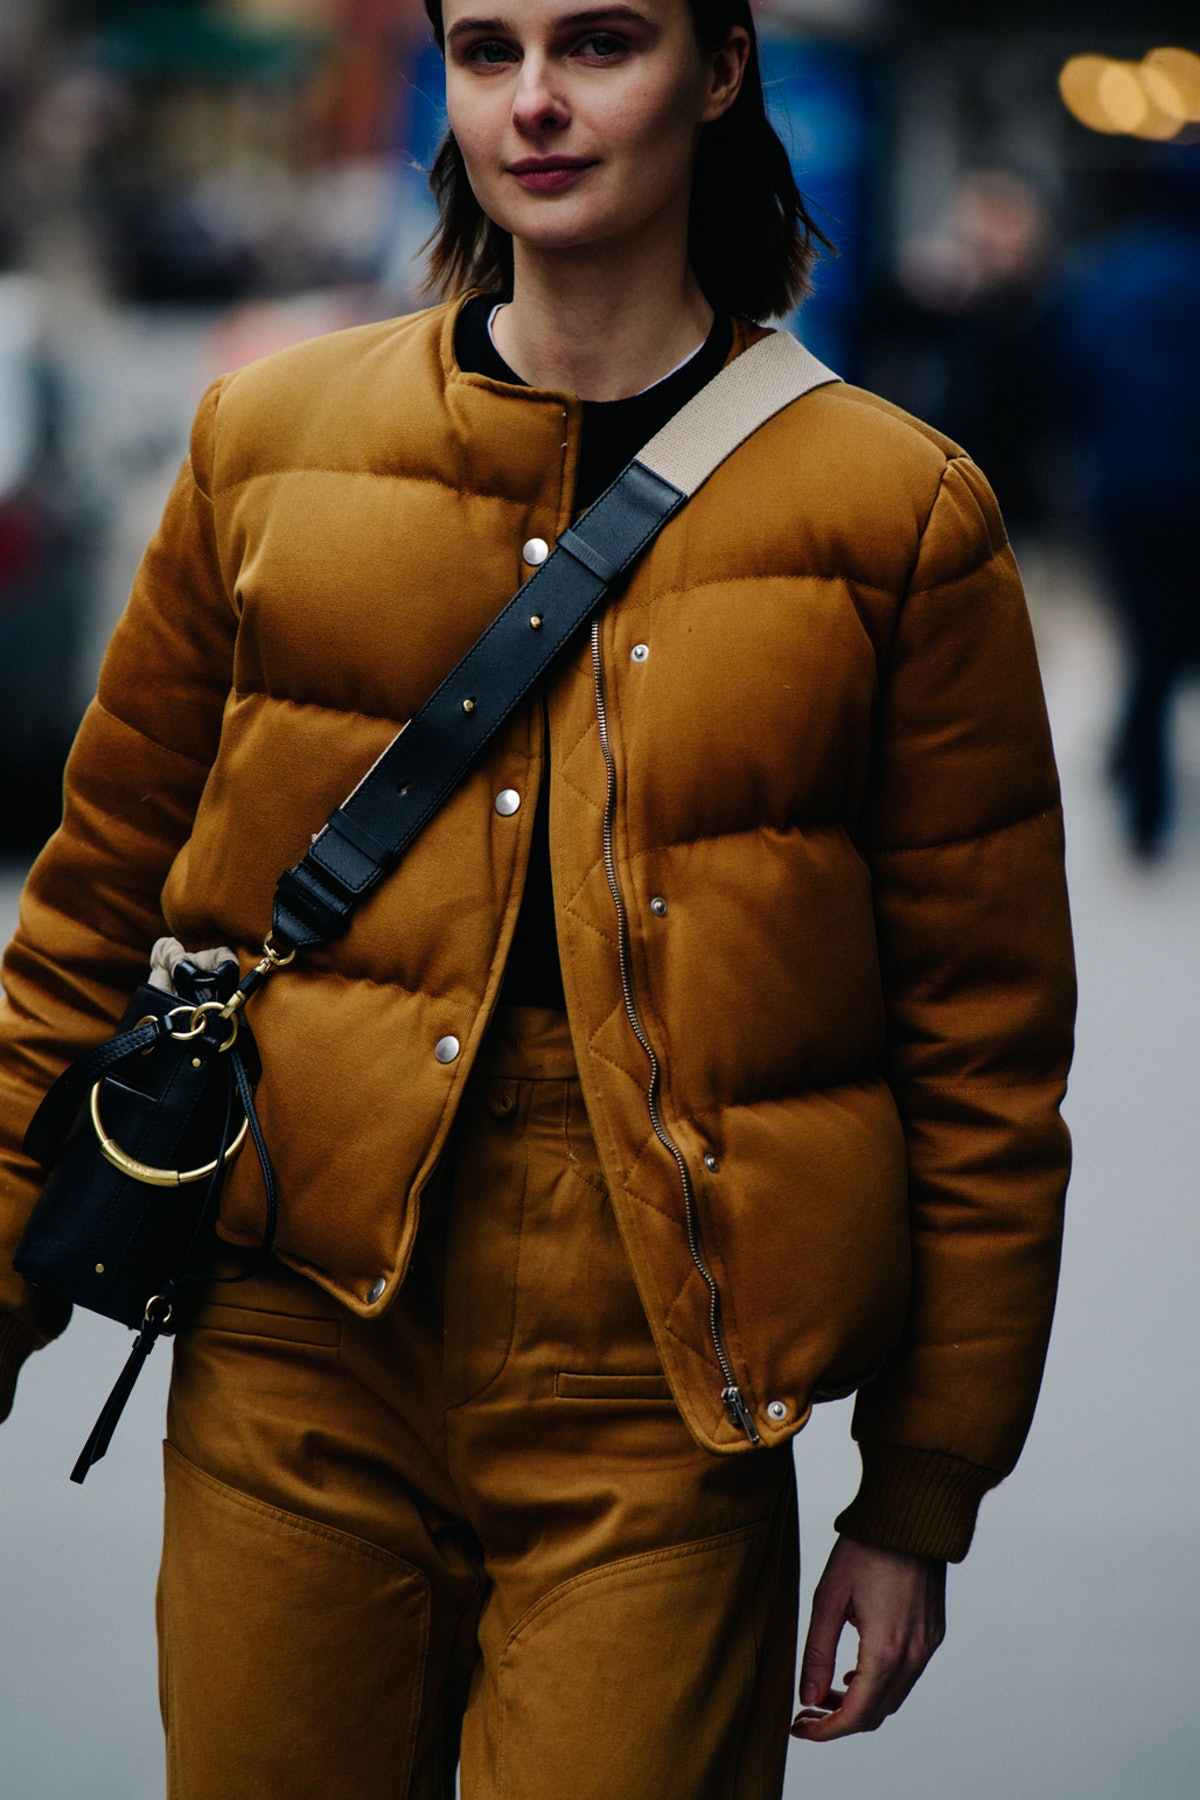 Adam-Katz-Sinding-W-Magazine-New-York-Fashion-Week-Fall-Winter-2019_AKS4414.jpg